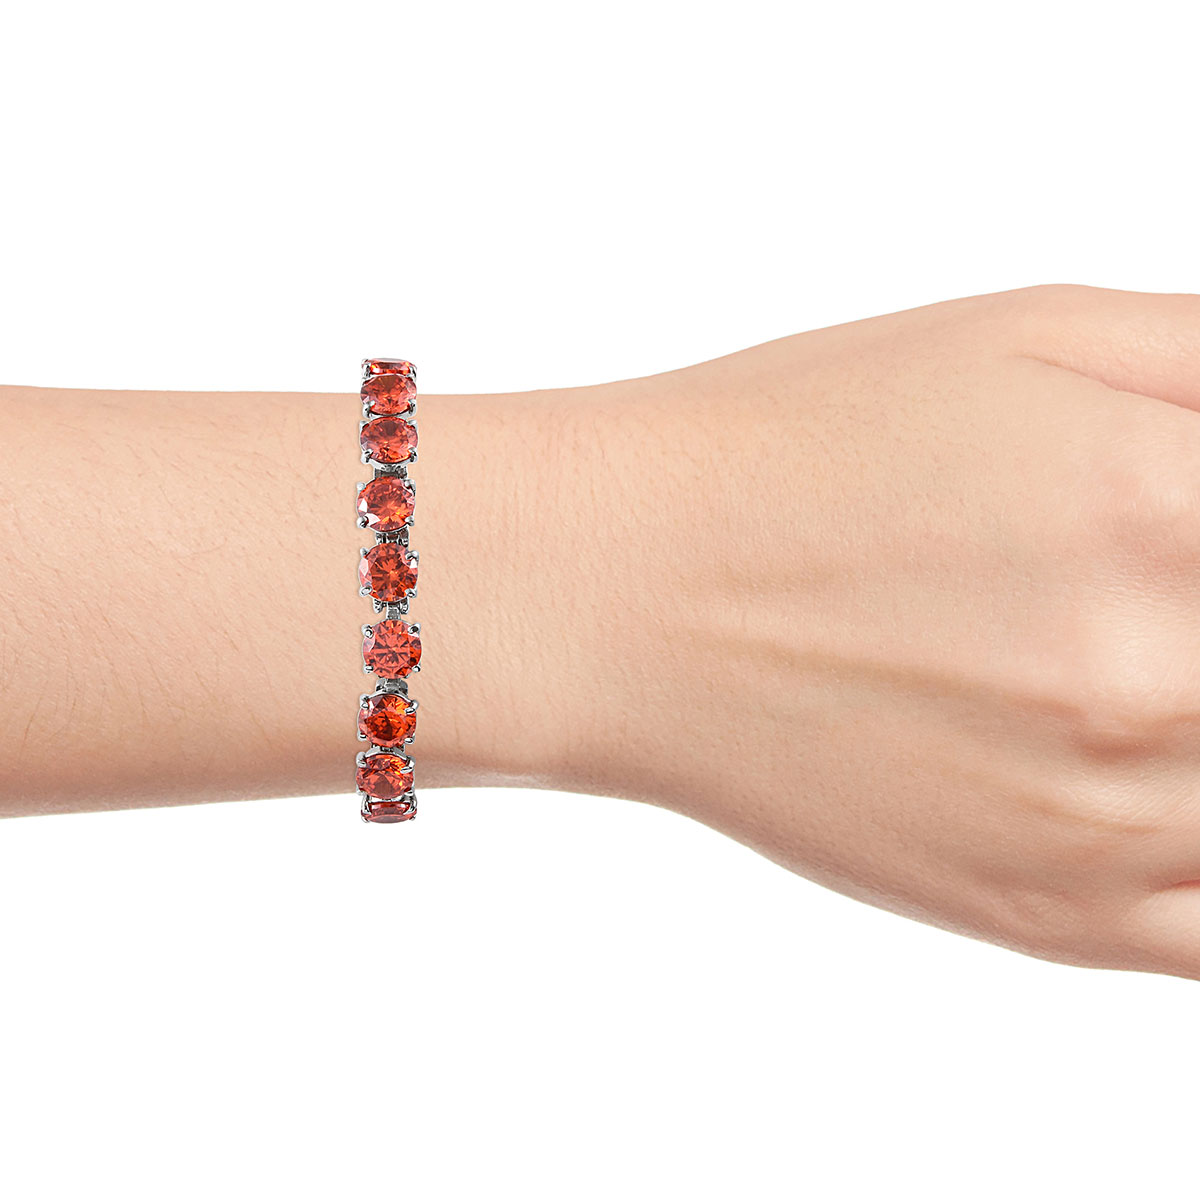 Steel-Cubic-Zirconia-CZ-Orange-Elegant-Adjustable-Bolo-Bracelet-for-Women-Ct-21 thumbnail 10